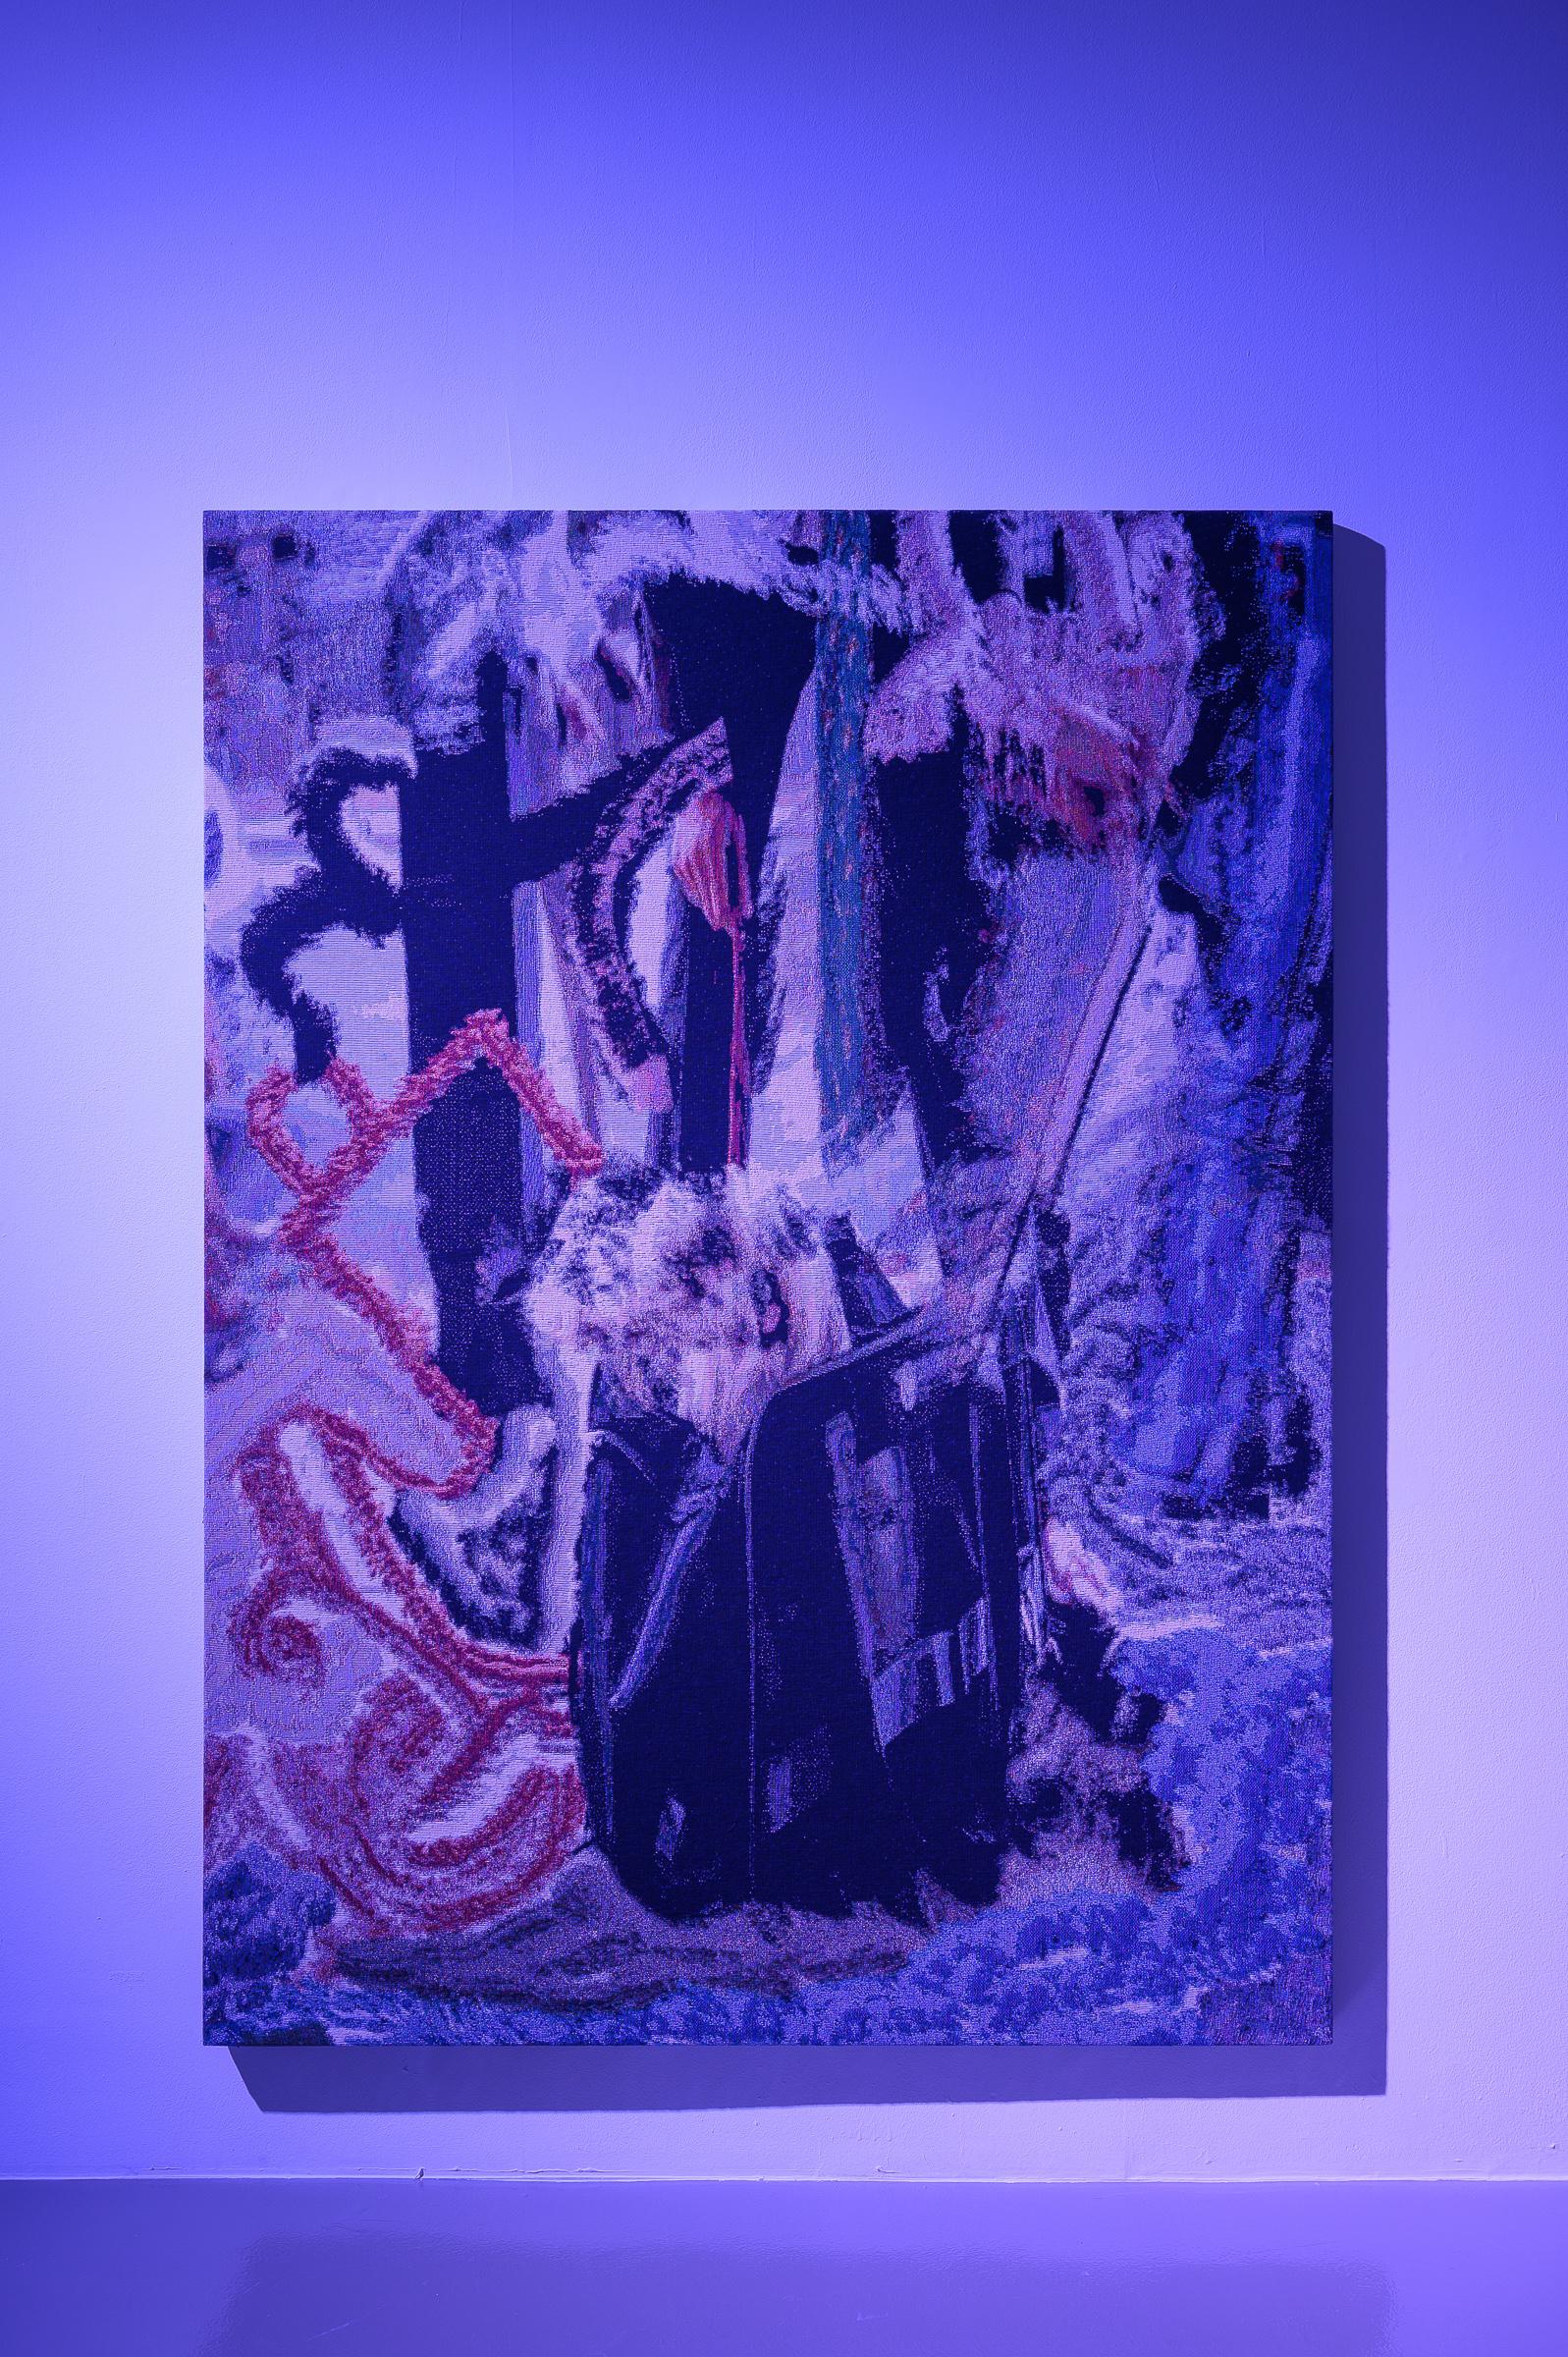 x+7J@c, 2019 190cm x 140cm Dye Cotton Tapestry